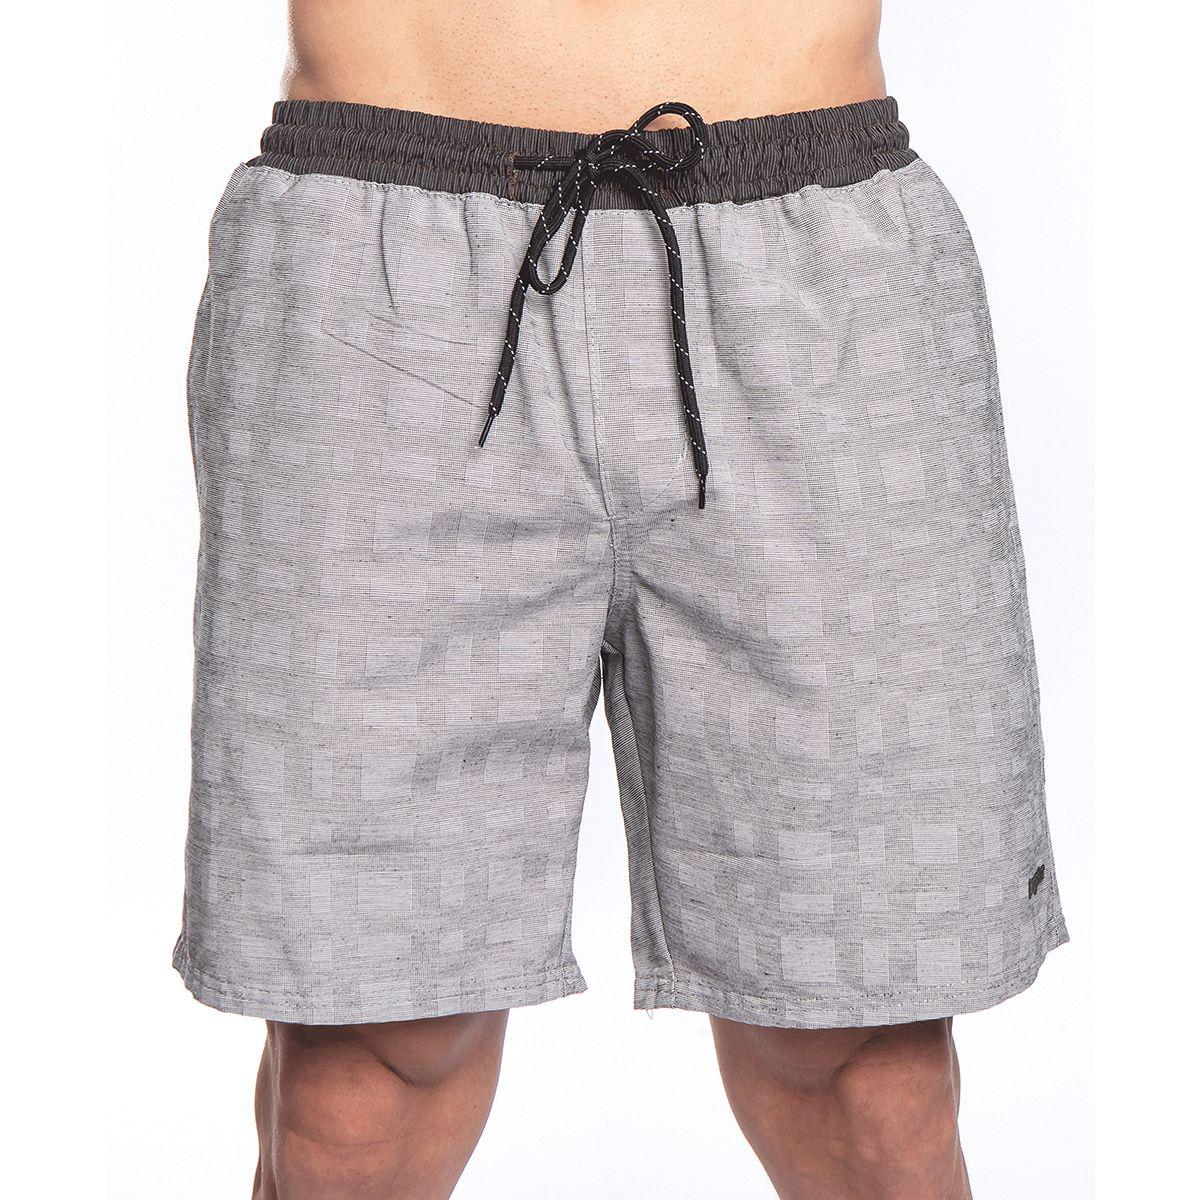 Shorts Masculino Gangster 68.02.0087